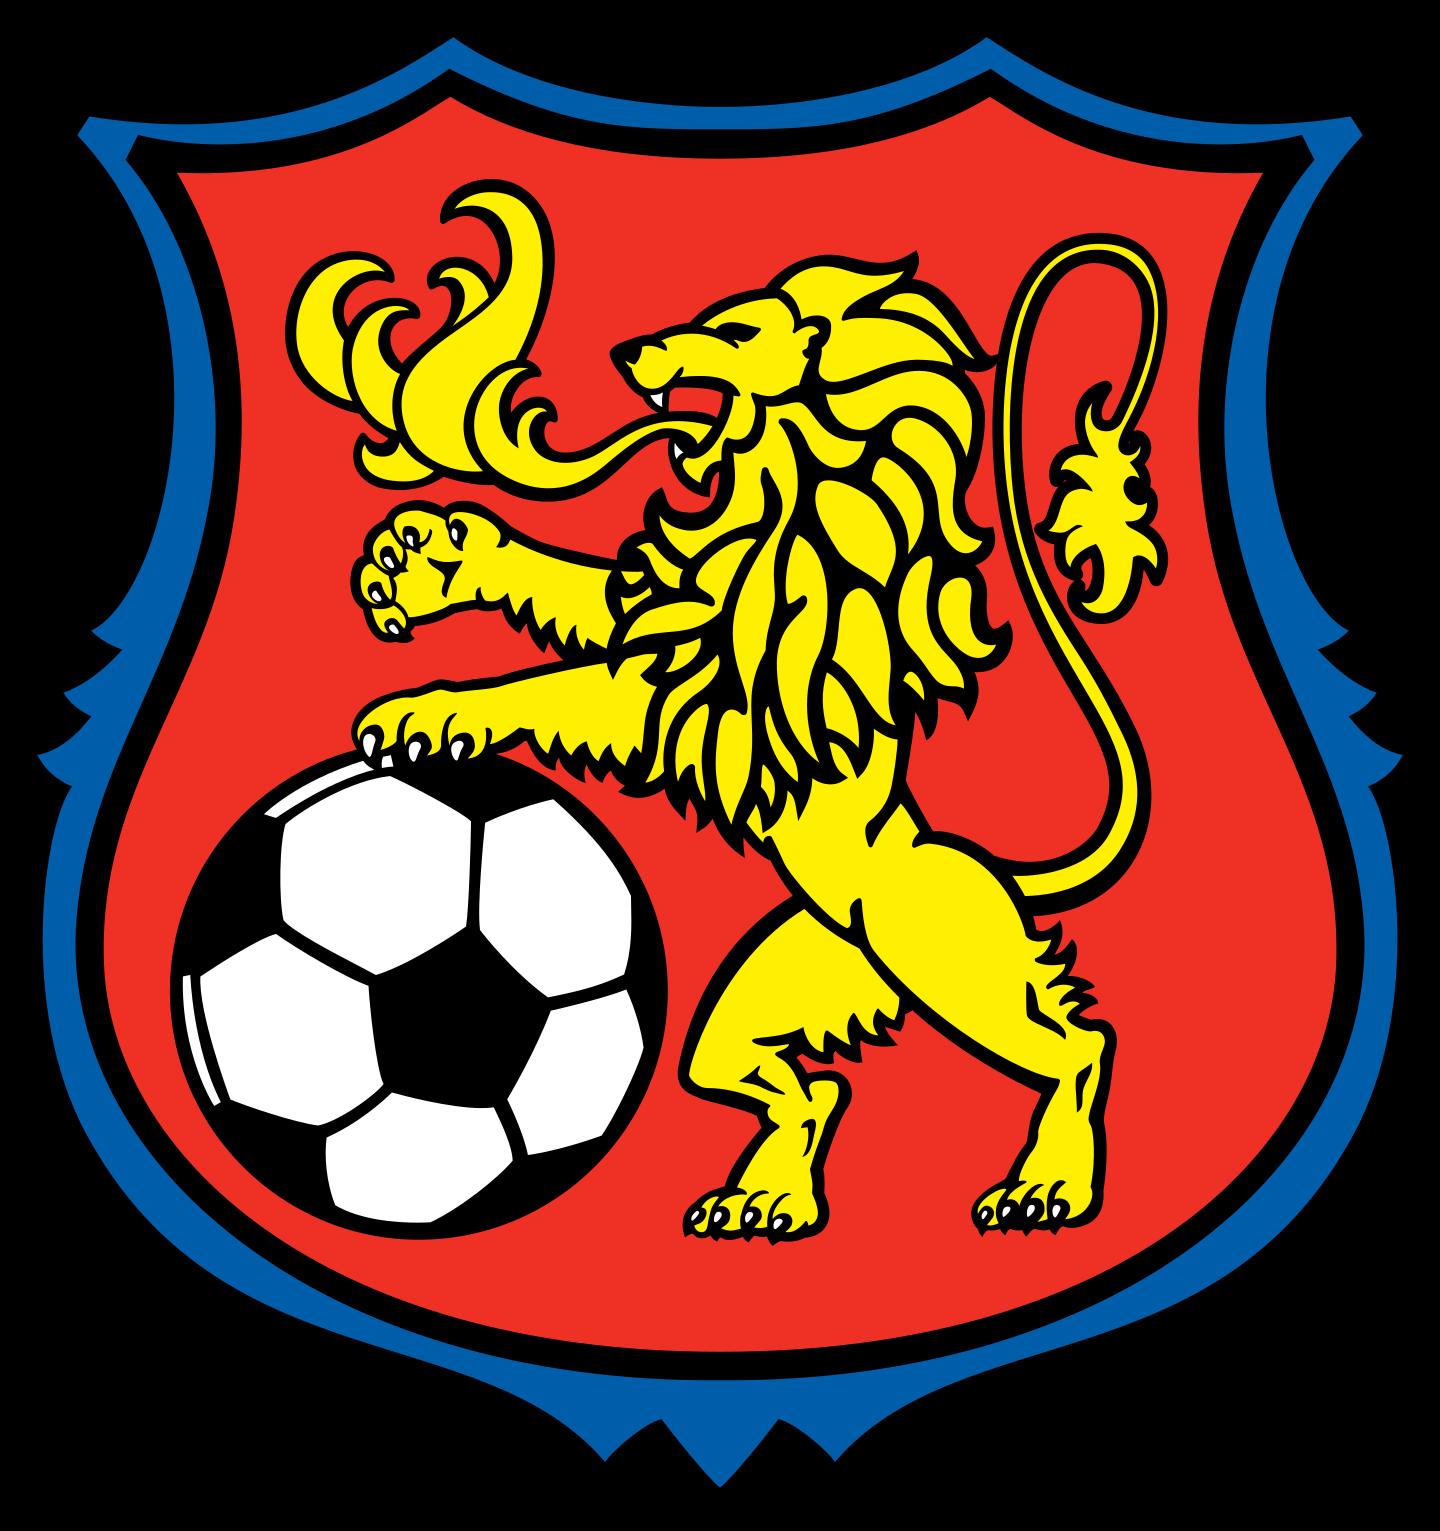 caracas fc logo 3 - Caracas FC Logo